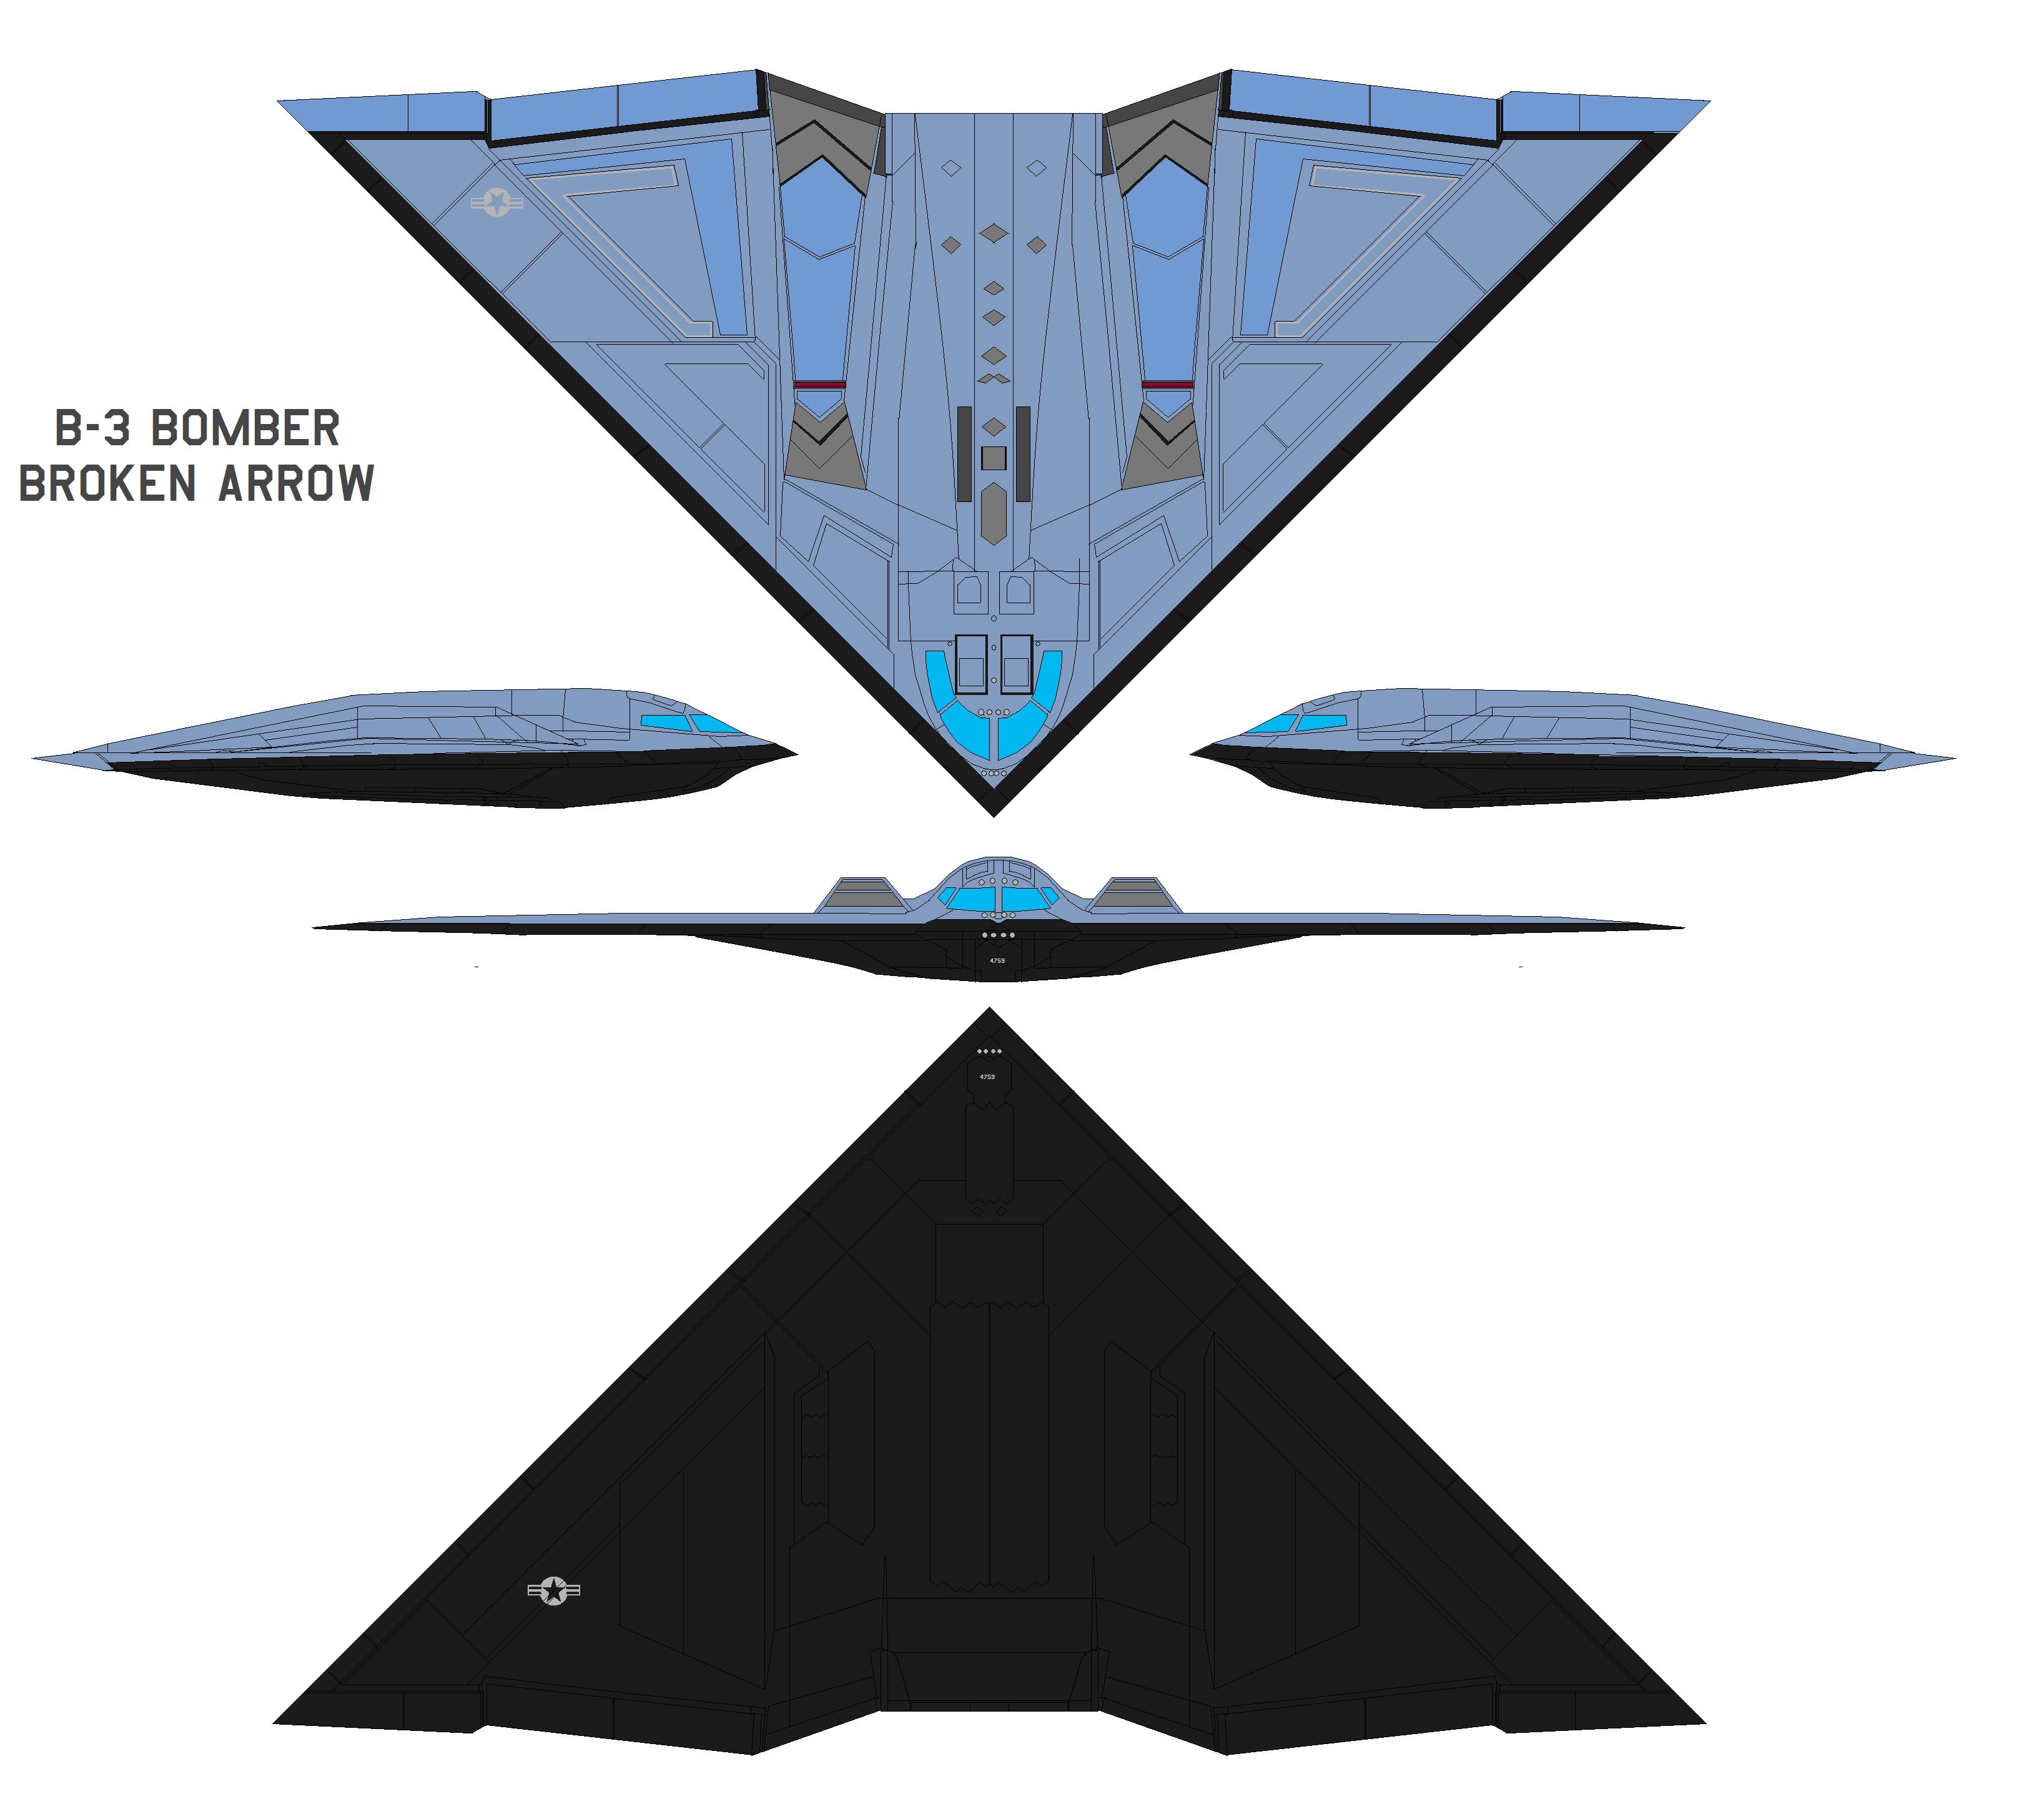 B-3 Bomber from Broken Arrow by bagera3005 on DeviantArt